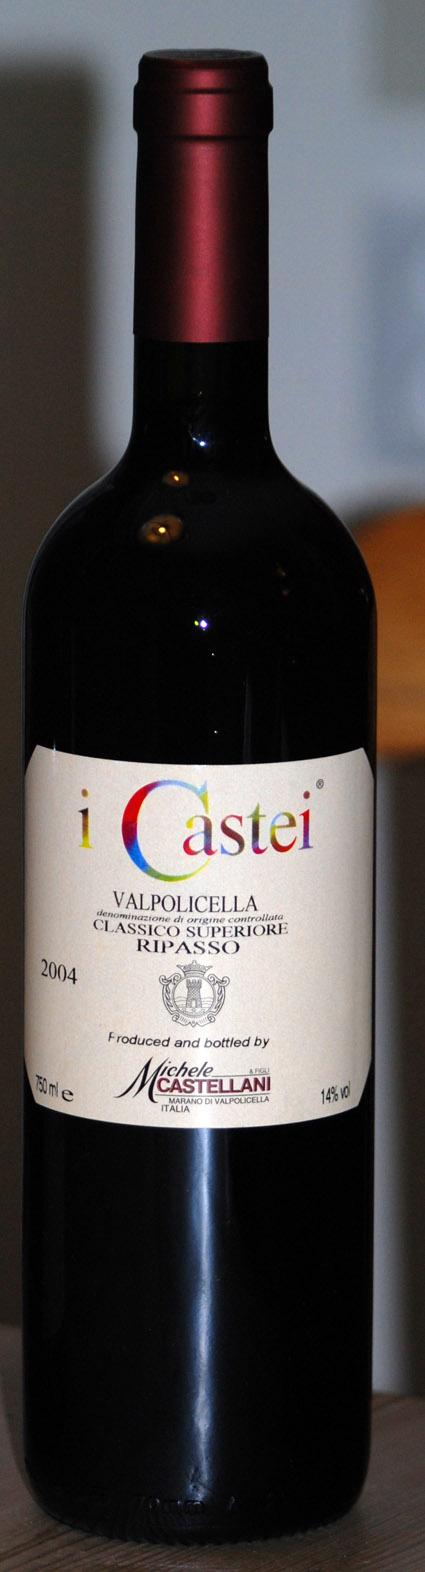 i Castei Ripasso ( Castellani ) 2010